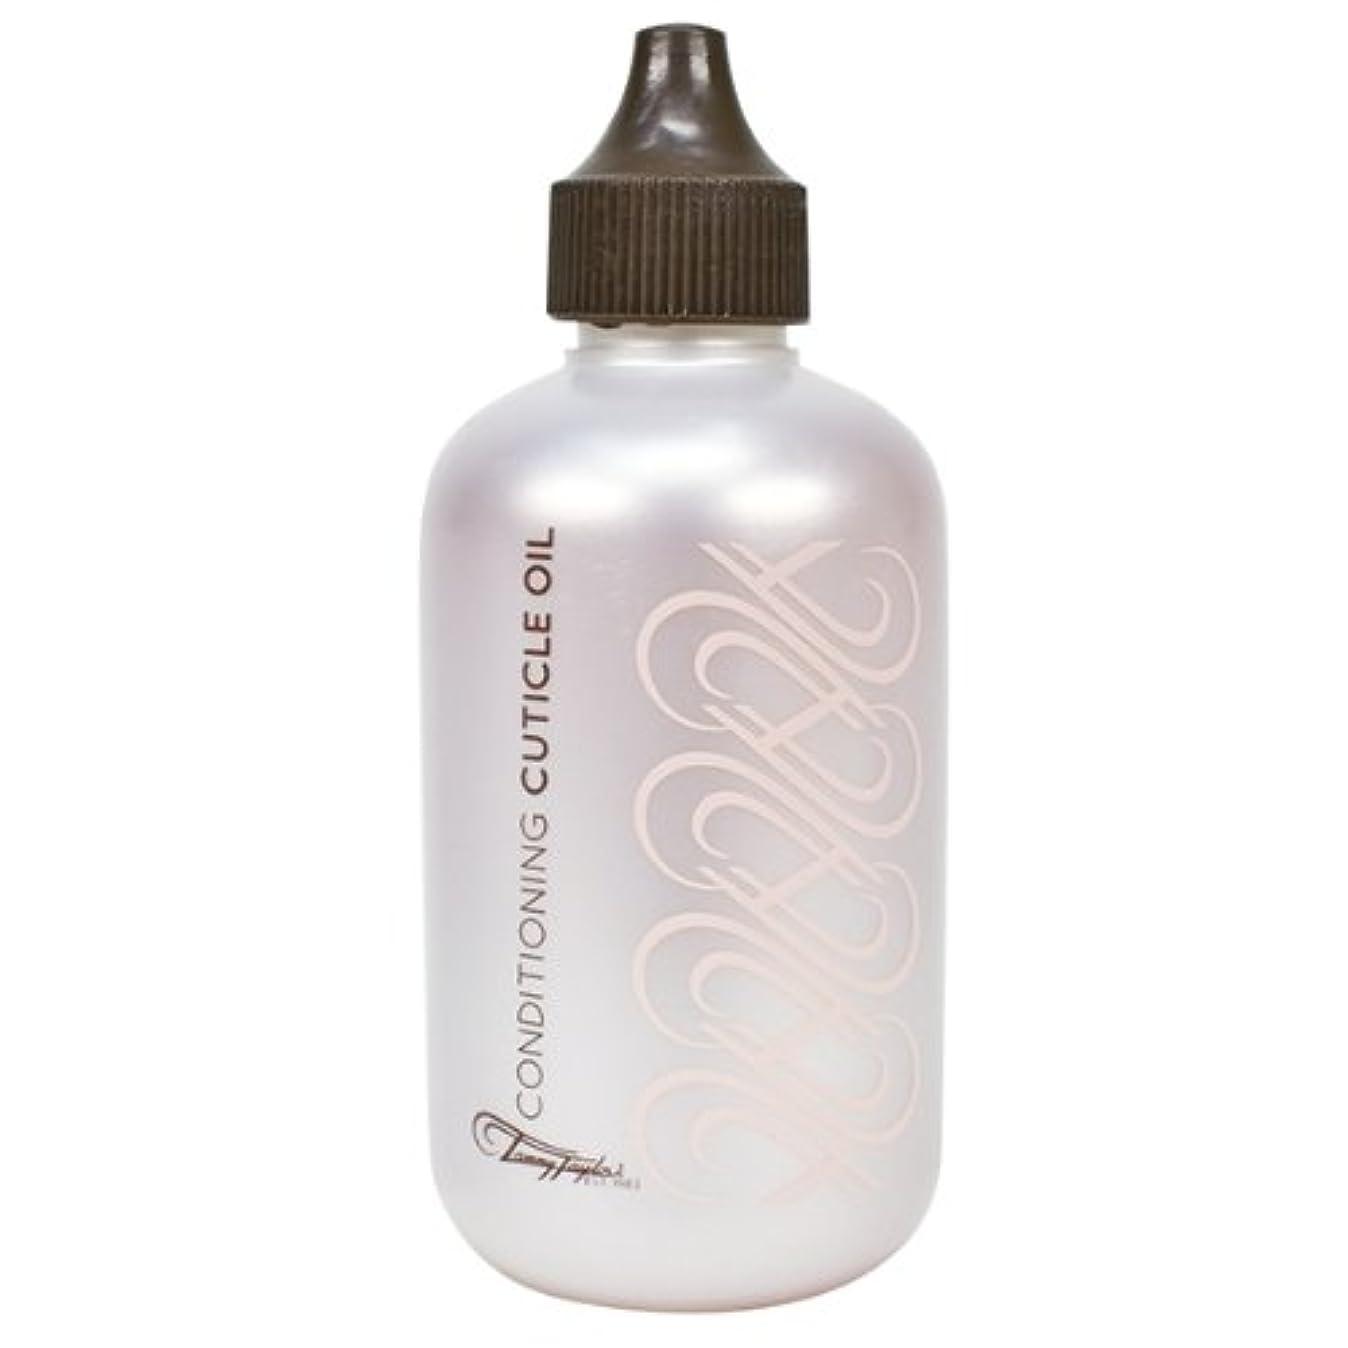 許可意外材料Tammy Taylor - Conditioning Cuticle Oil -Peach - 4 Oz / 118mL